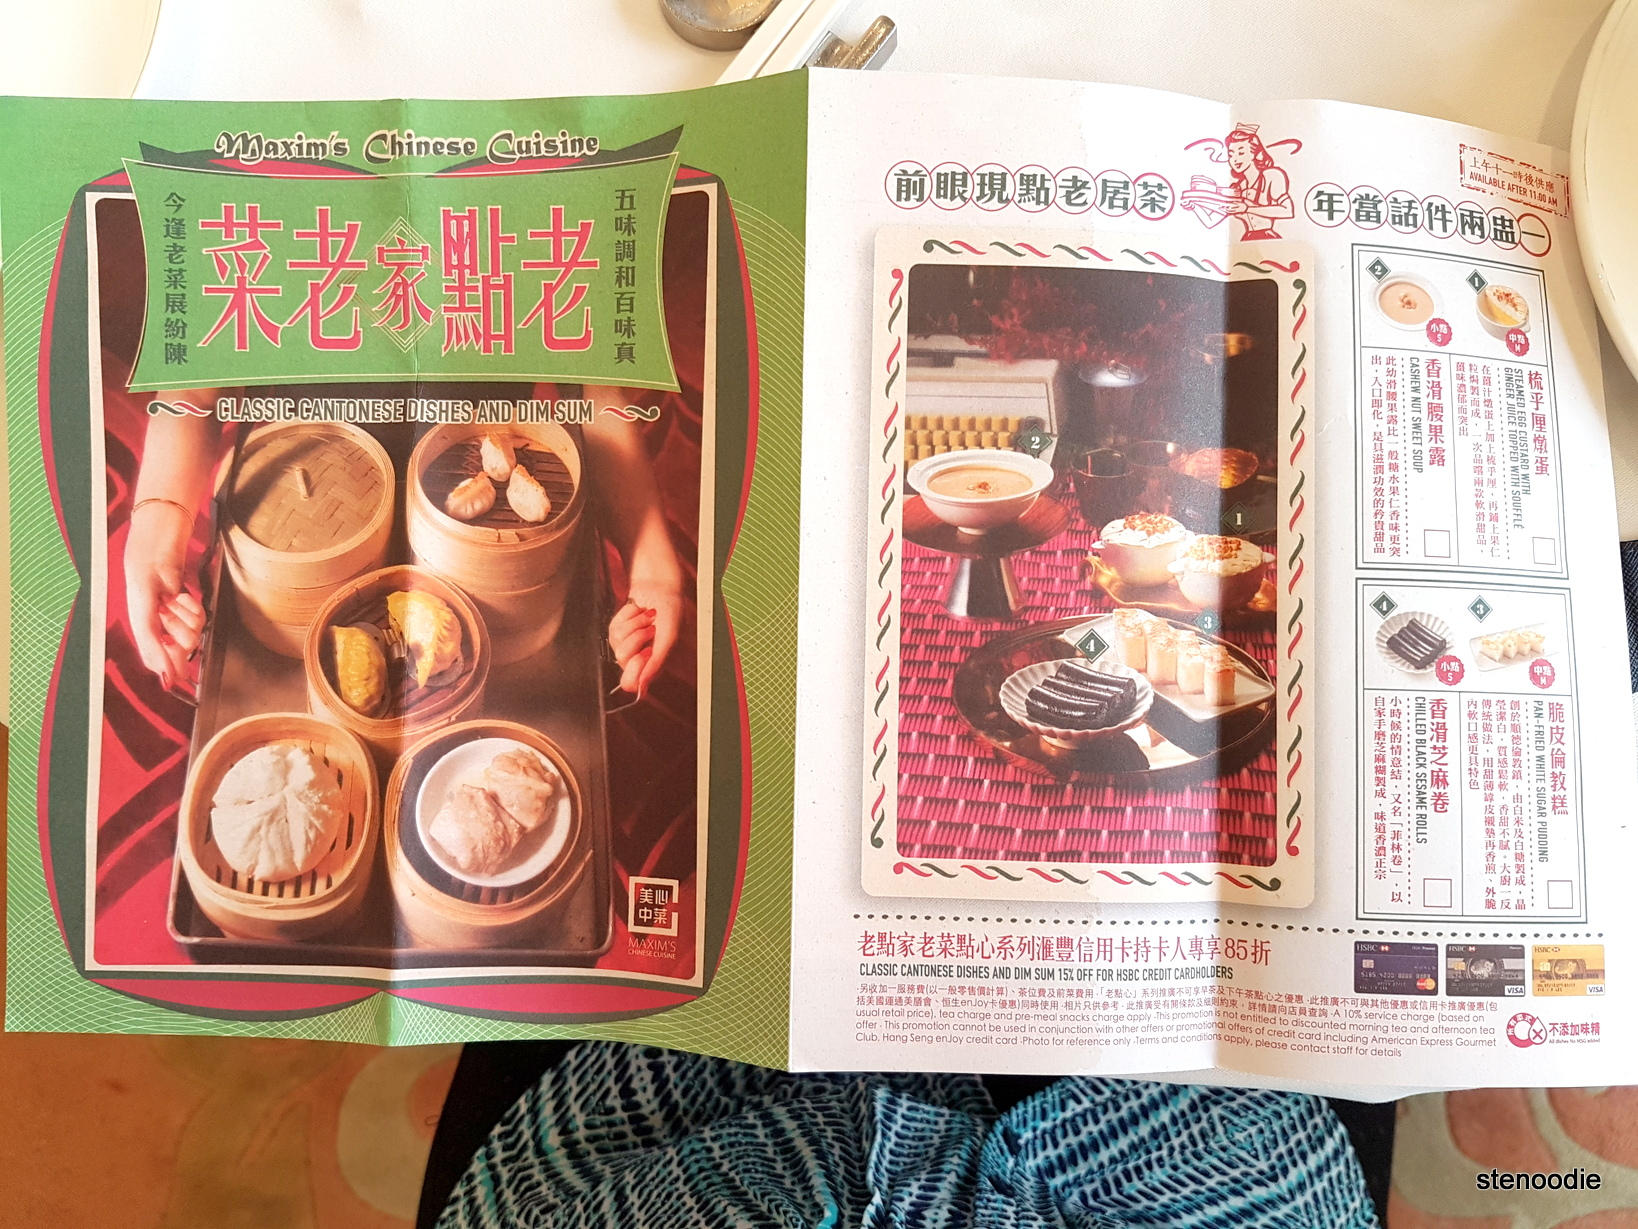 Maxim's Palace Chinese Restaurant dim sum menu